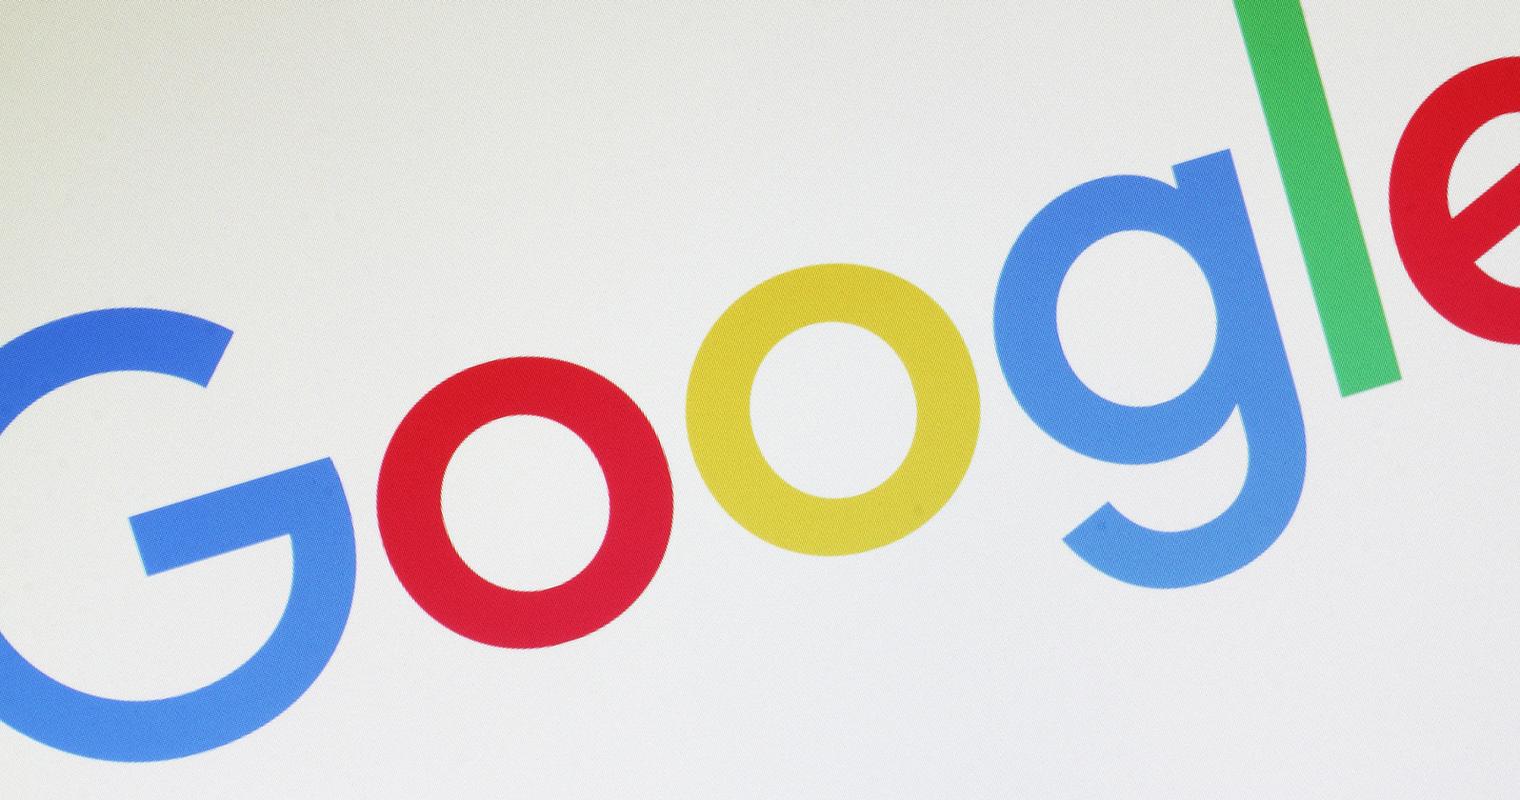 Google Acquires Fabric, a Mobile App Development Platform